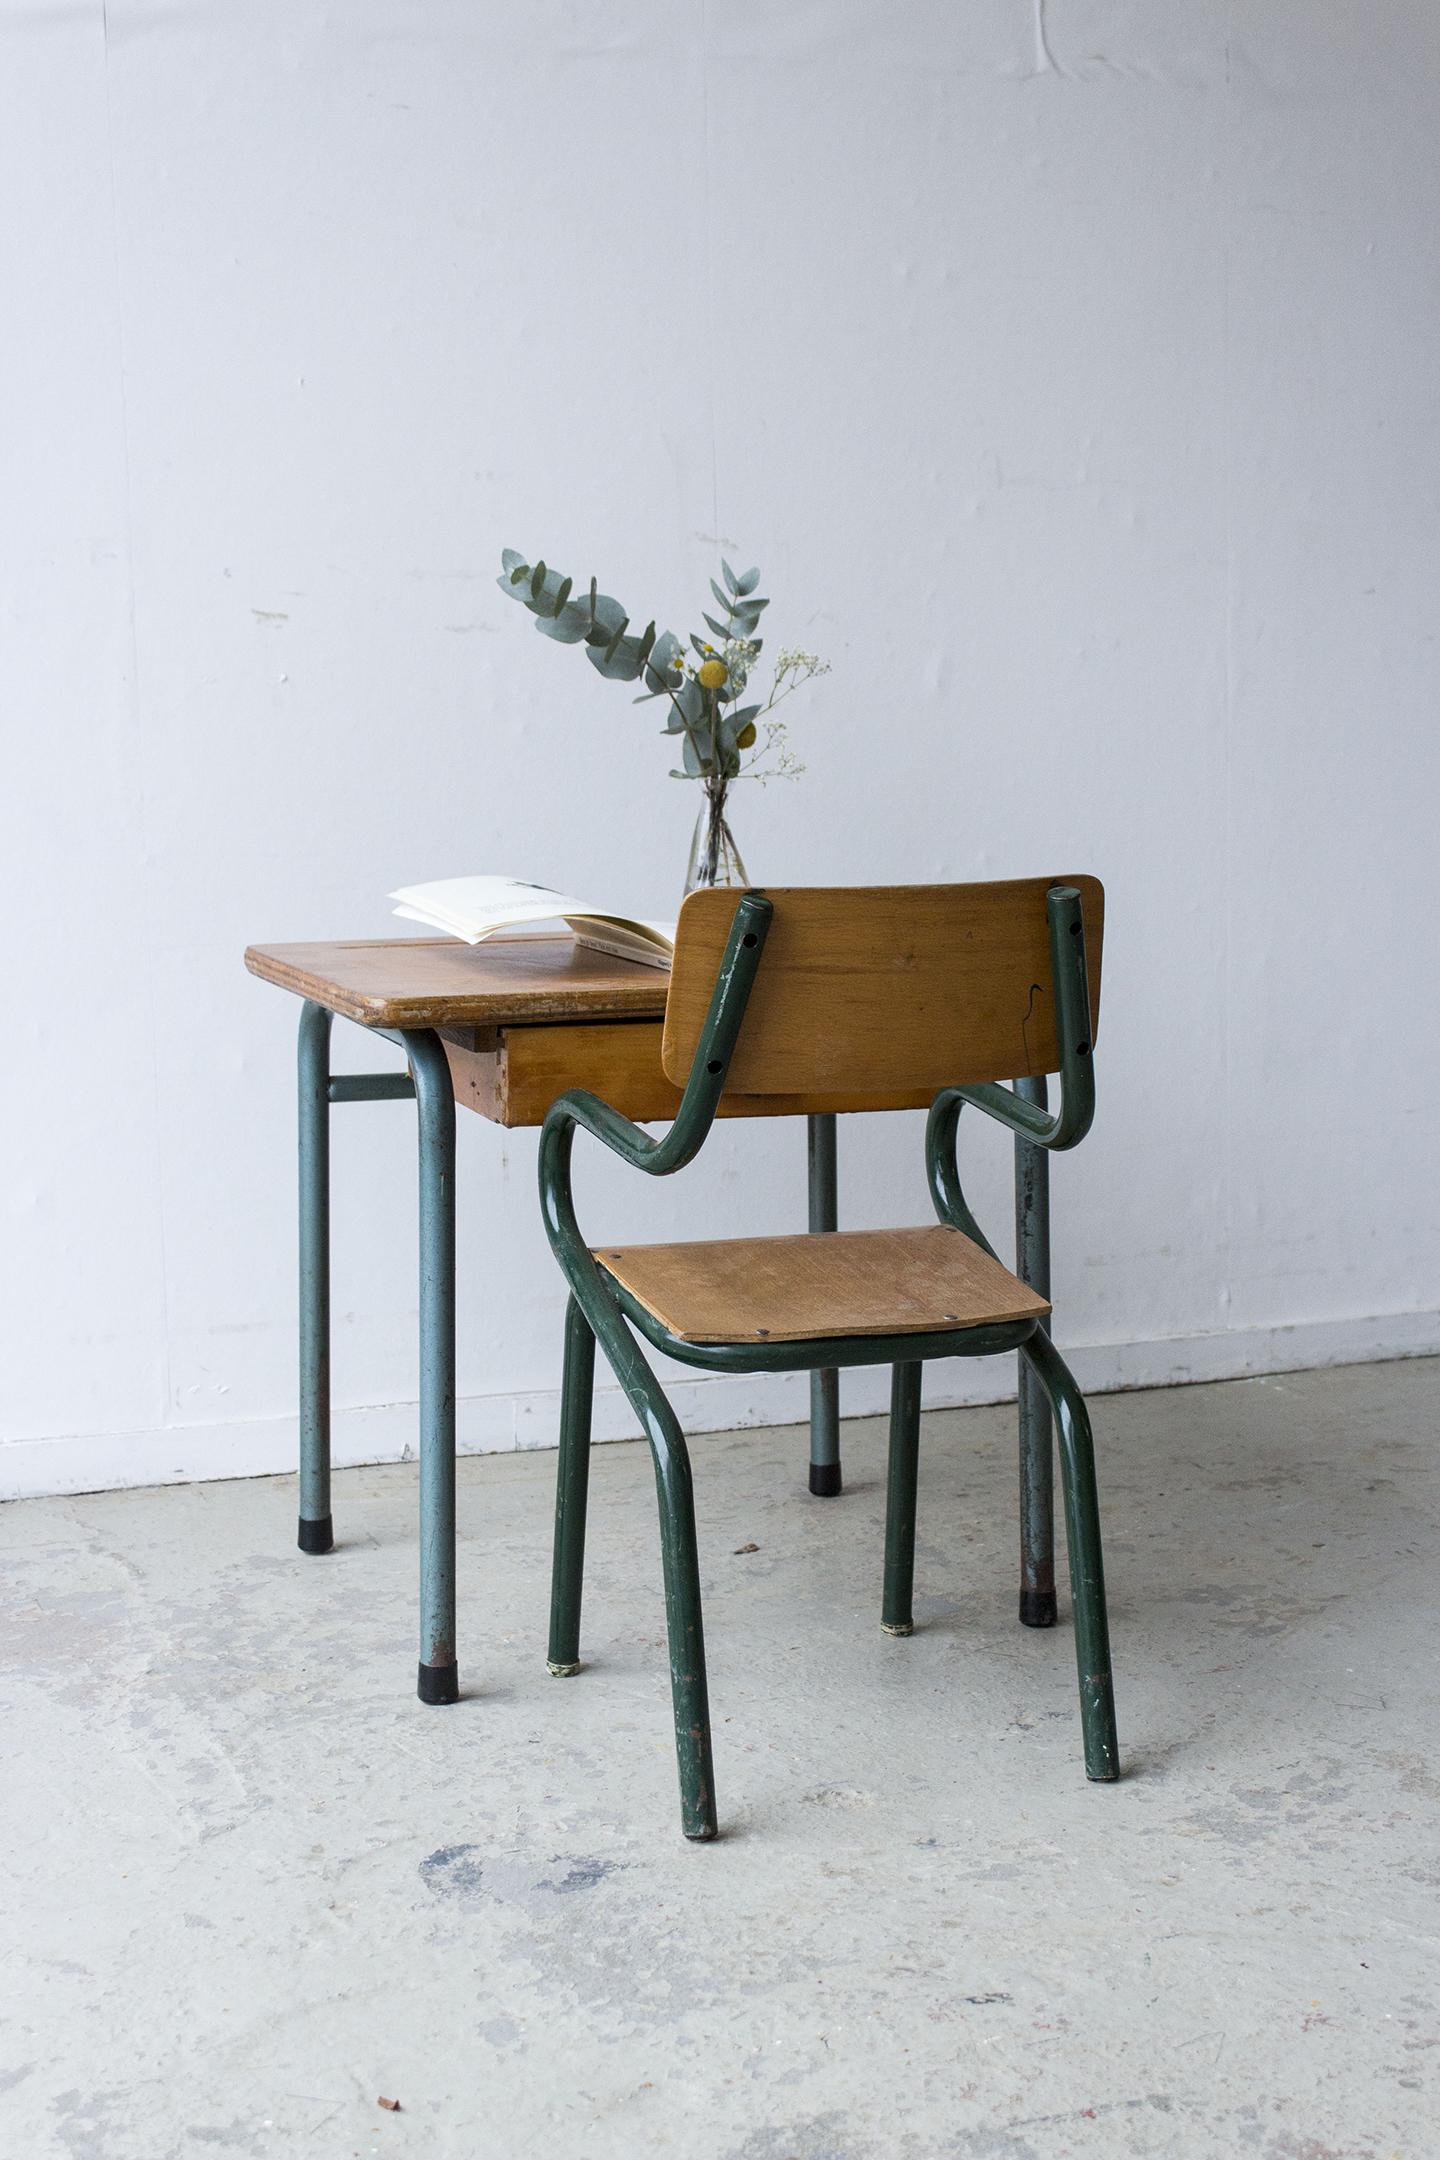 3166 - vintage kleutertafeltje met stoeltje - Firma zoethout_2.jpg